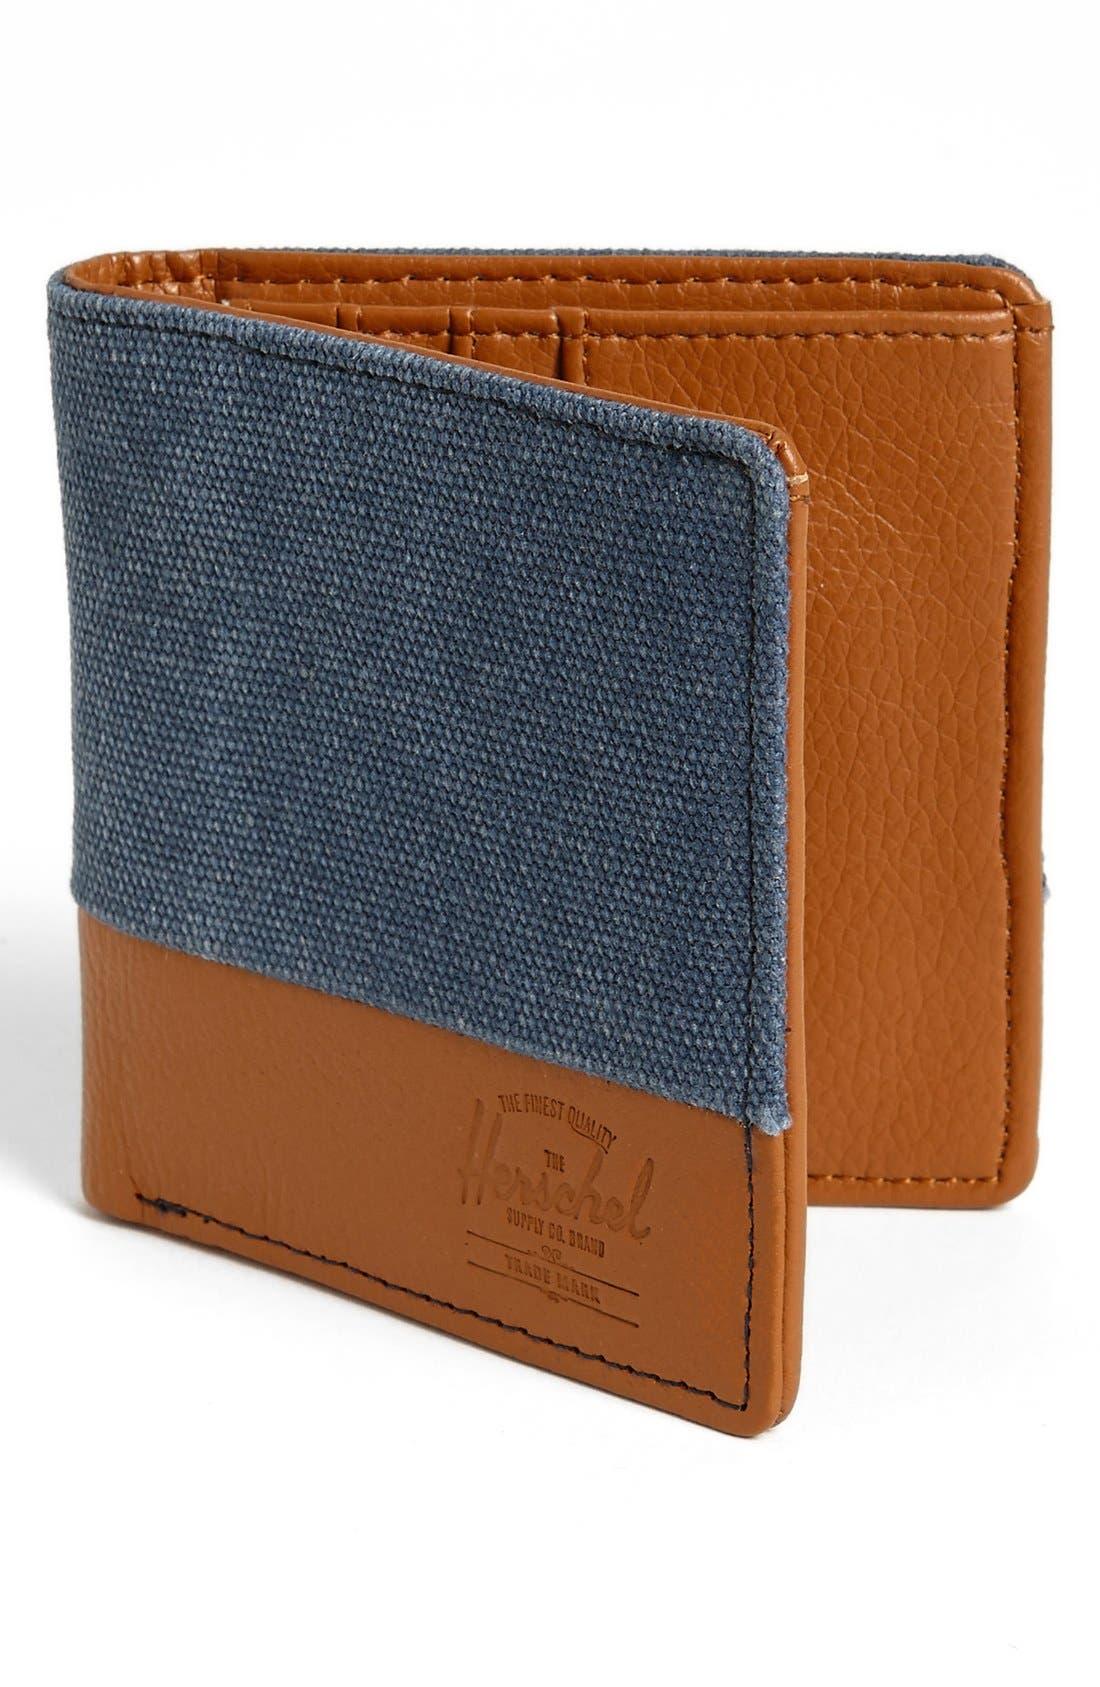 Alternate Image 1 Selected - Herschel Supply Co. 'Kenny' Wallet